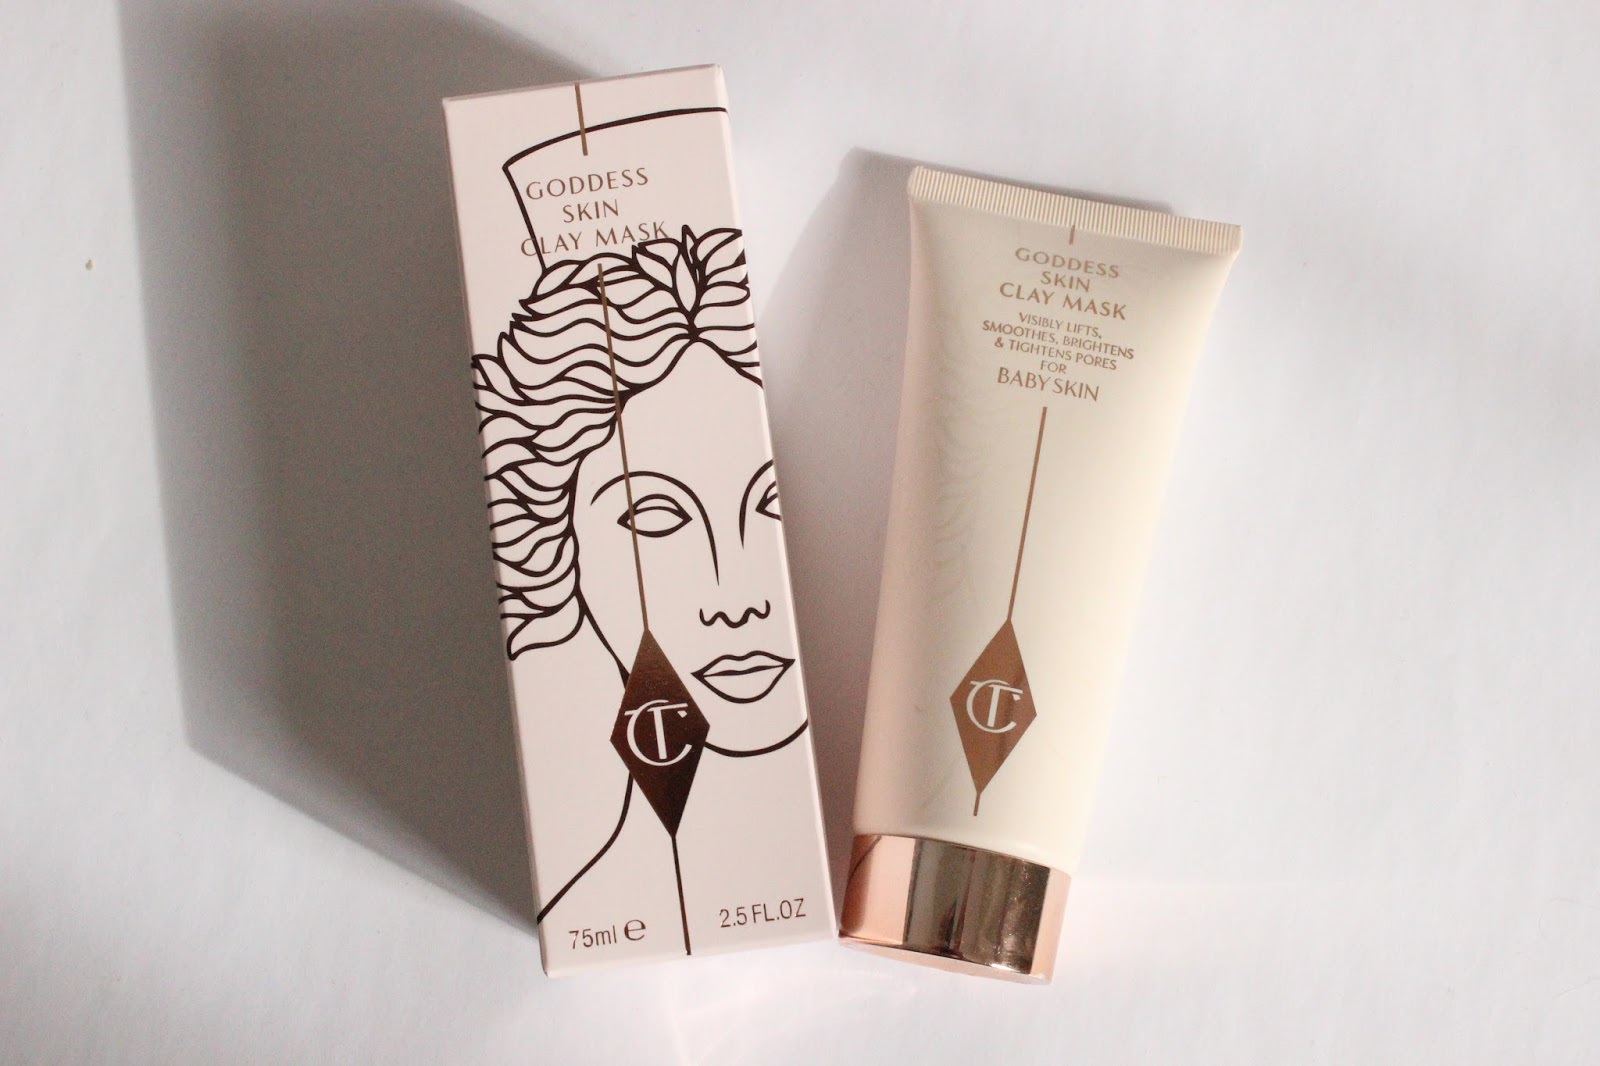 Charlotte Tilbury Goddess Skin Clay Mask